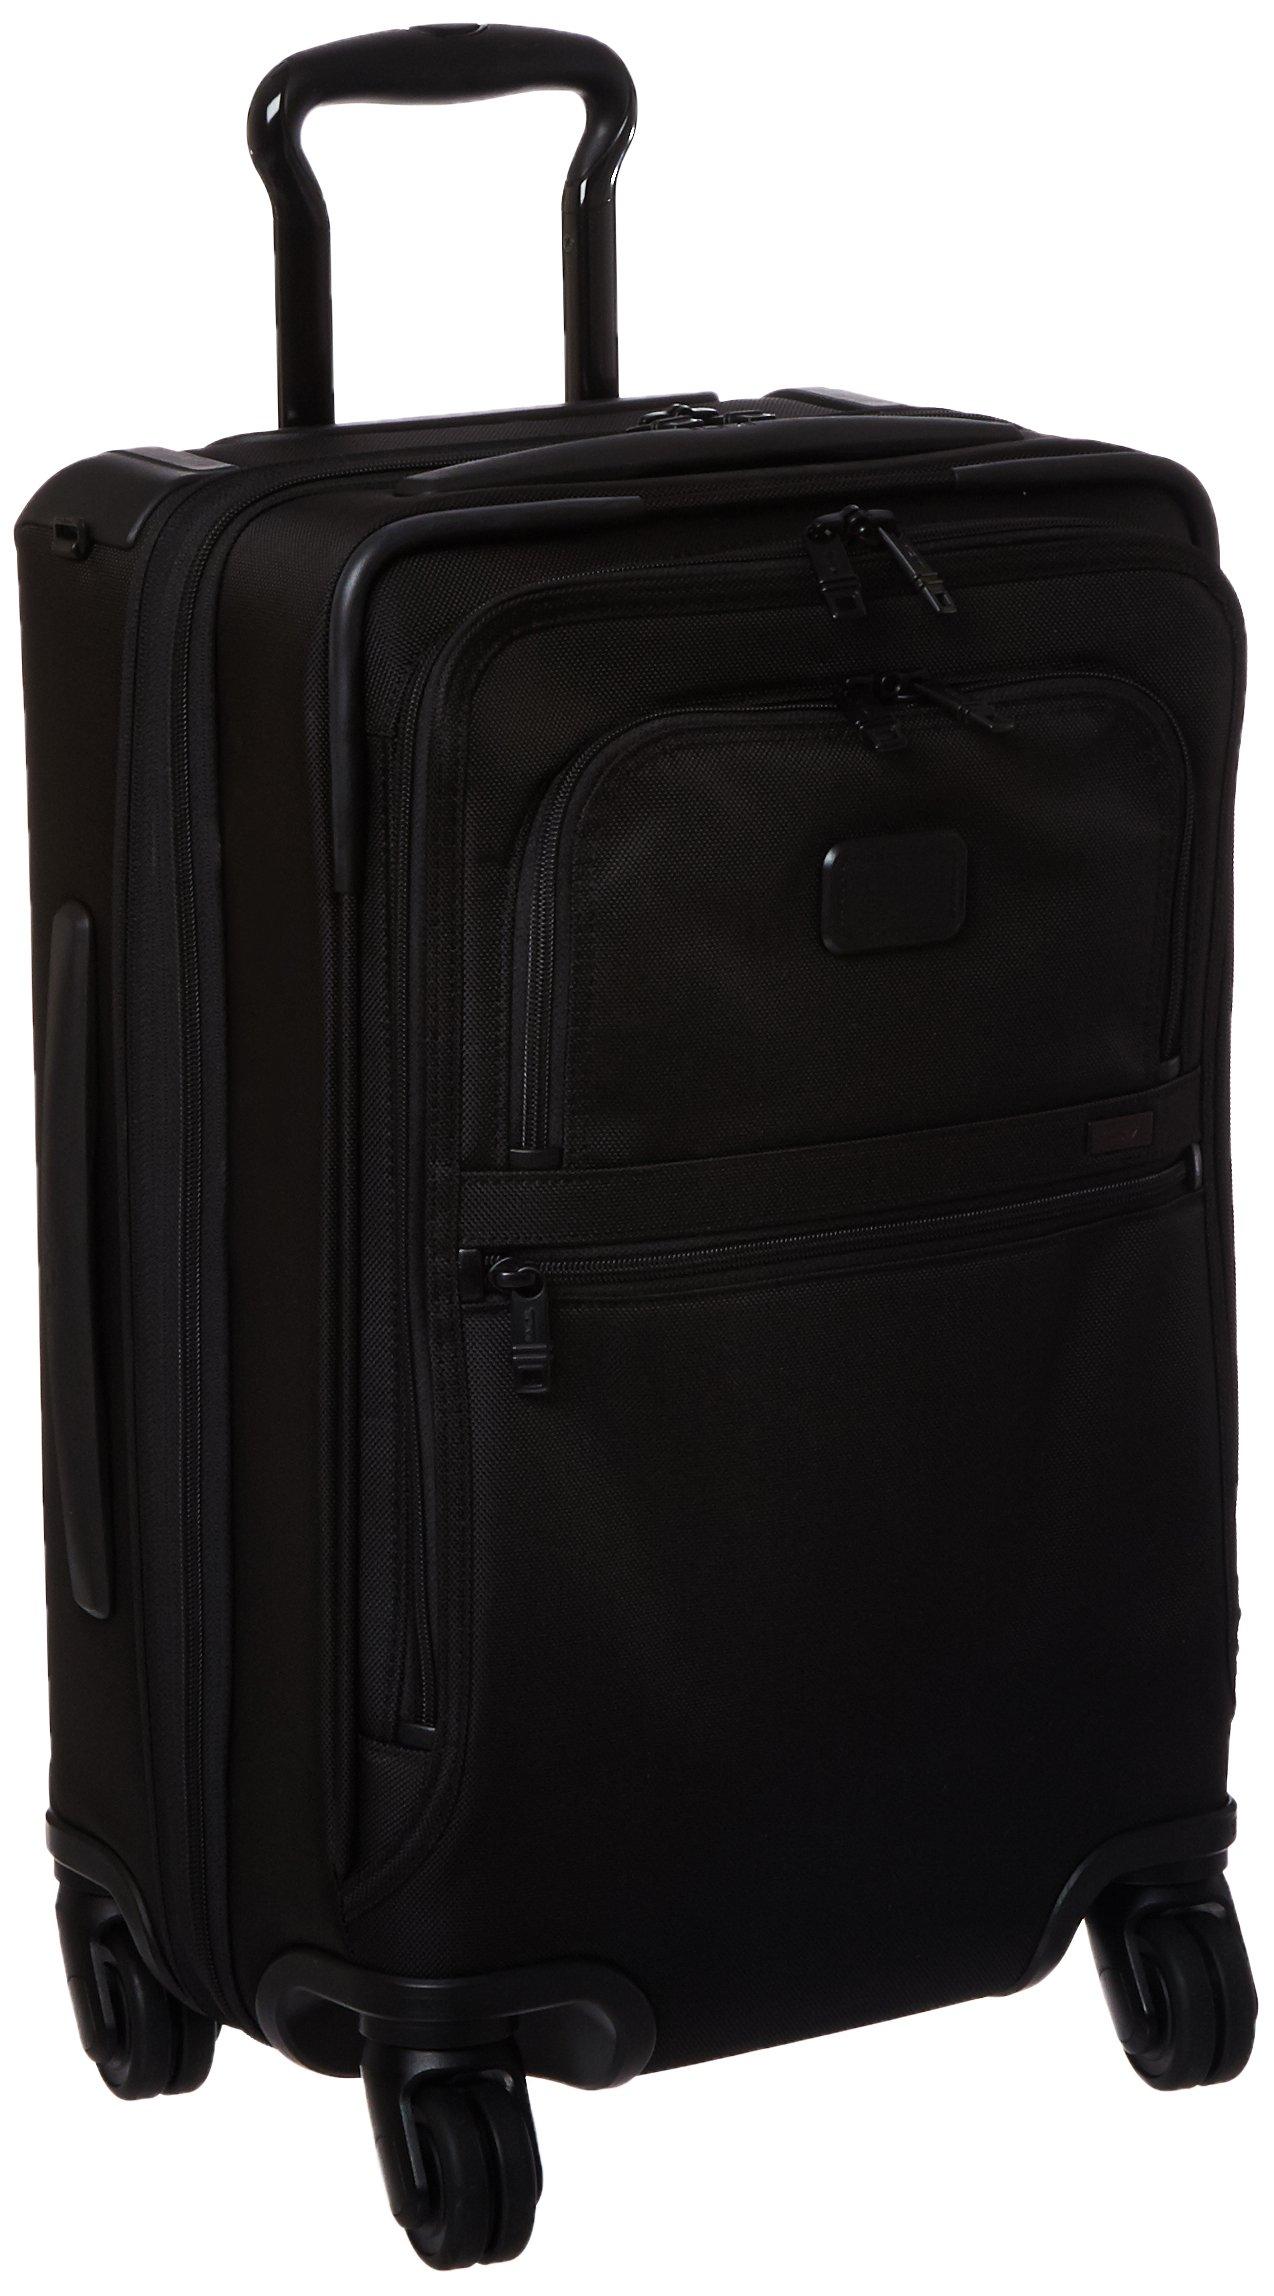 Tumi Alpha Ballistic Business 4 Wheel International Office Carry-On, Black, One Size by Tumi